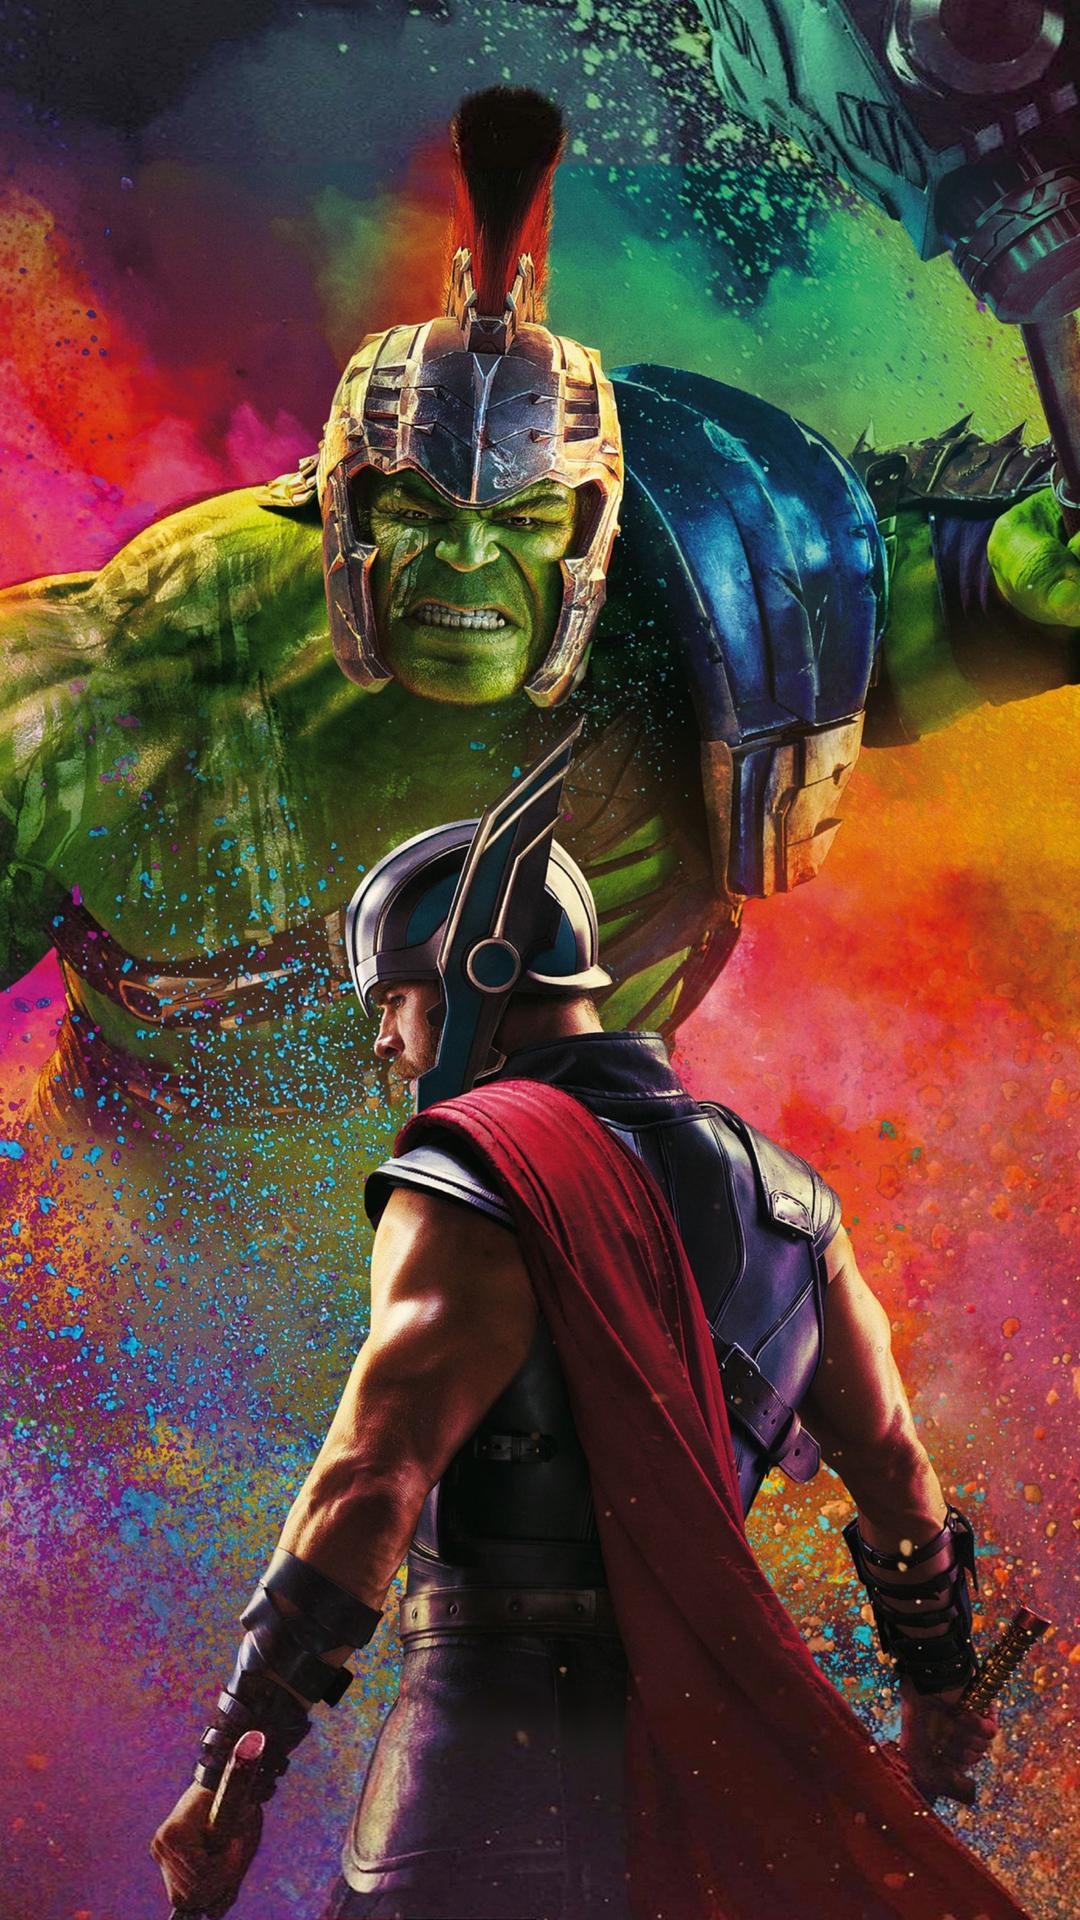 thor-hulk-in-thor-ragnarok-g8.jpg